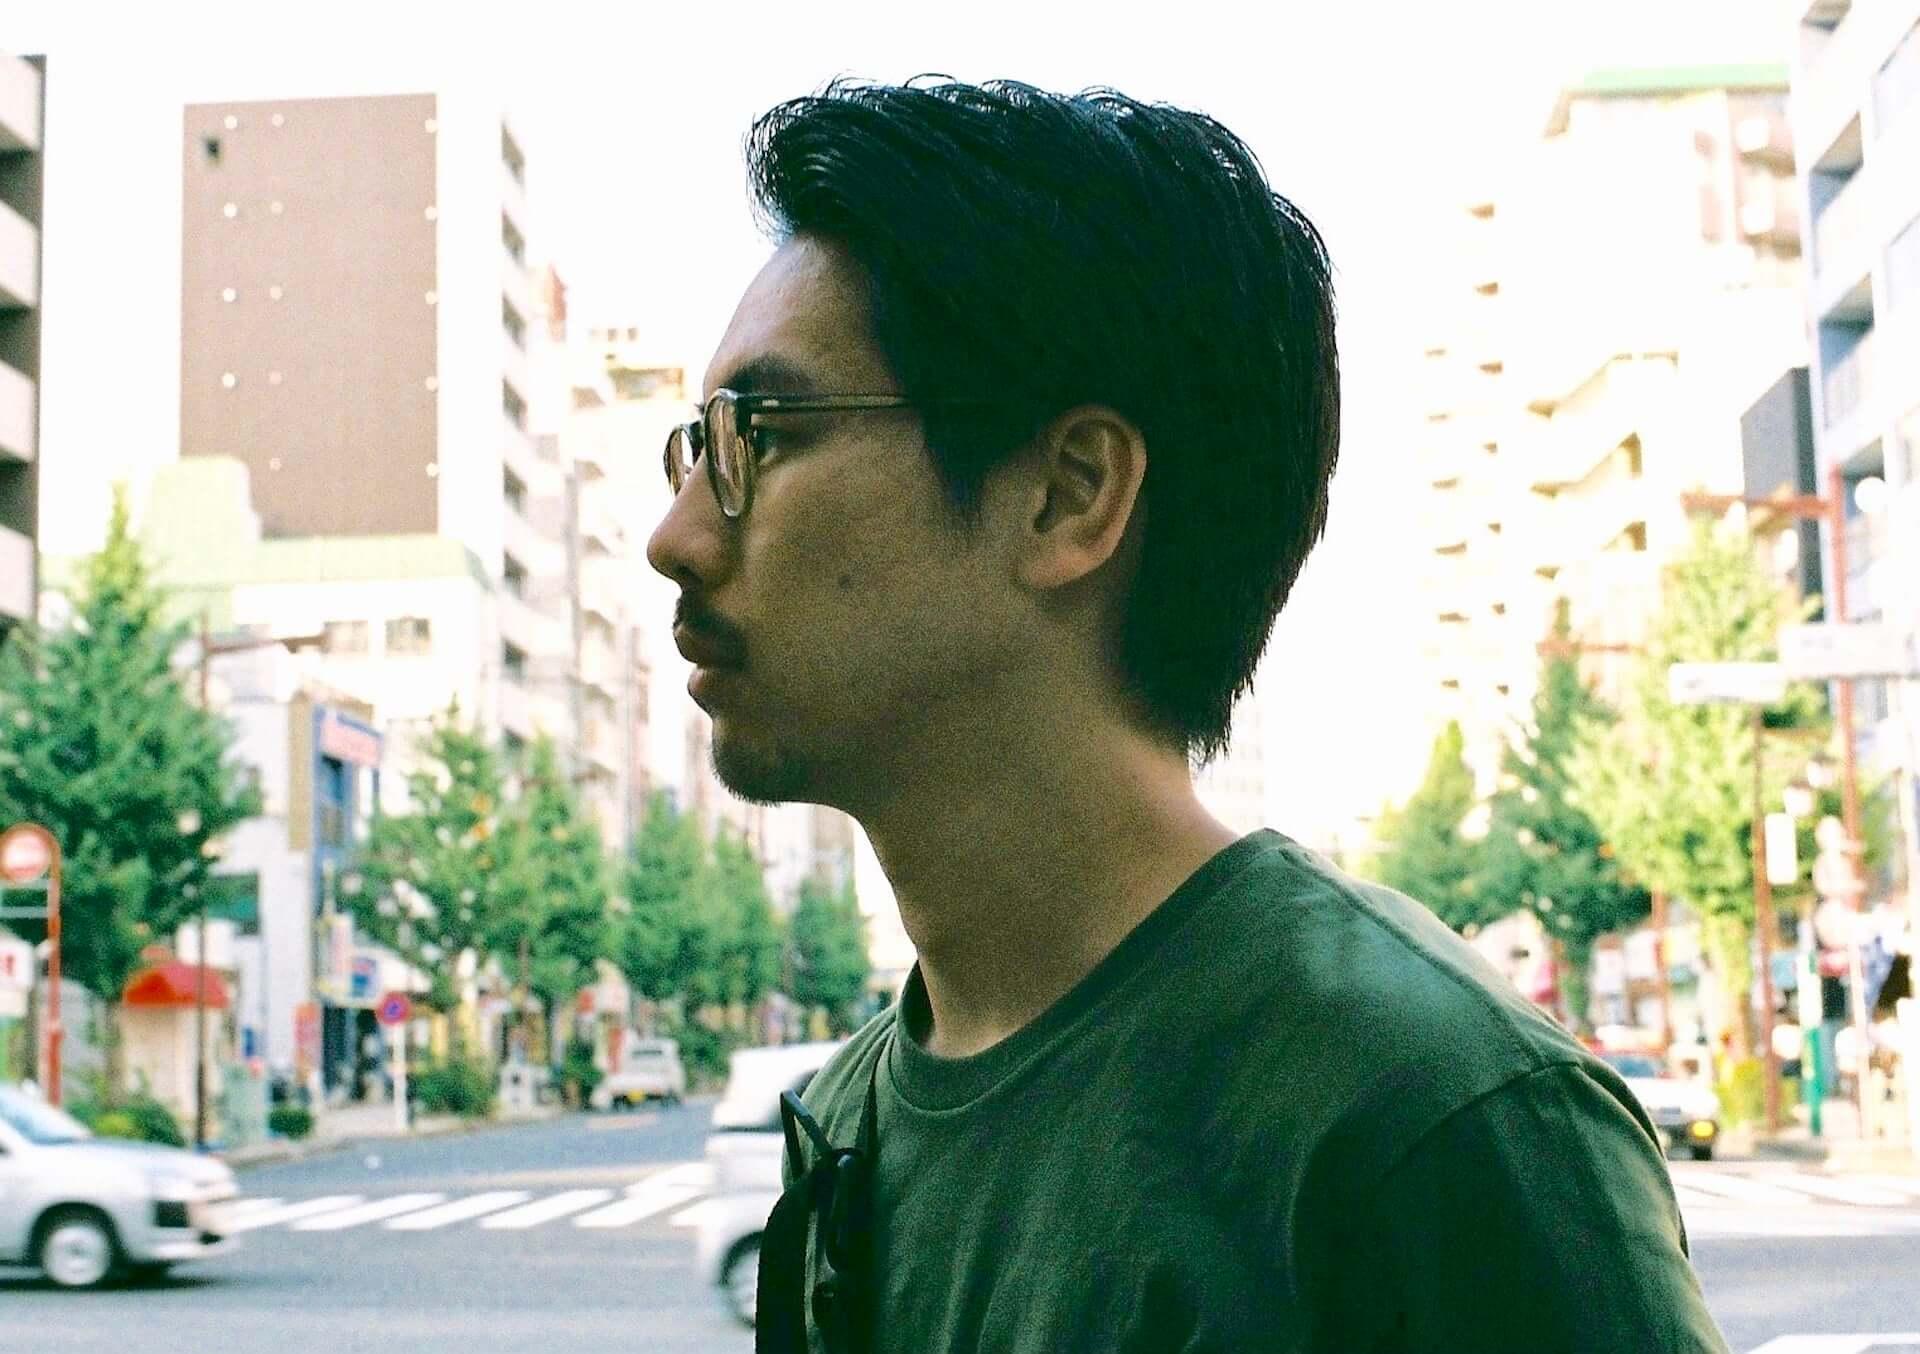 "maco maretsがTOSHIKI HAYASHI(%C)を迎えたリミックスシングル""Forest Song (Remix)""をリリース!新作は2月に発表予定 music210120_macomarets_2-1920x1354"